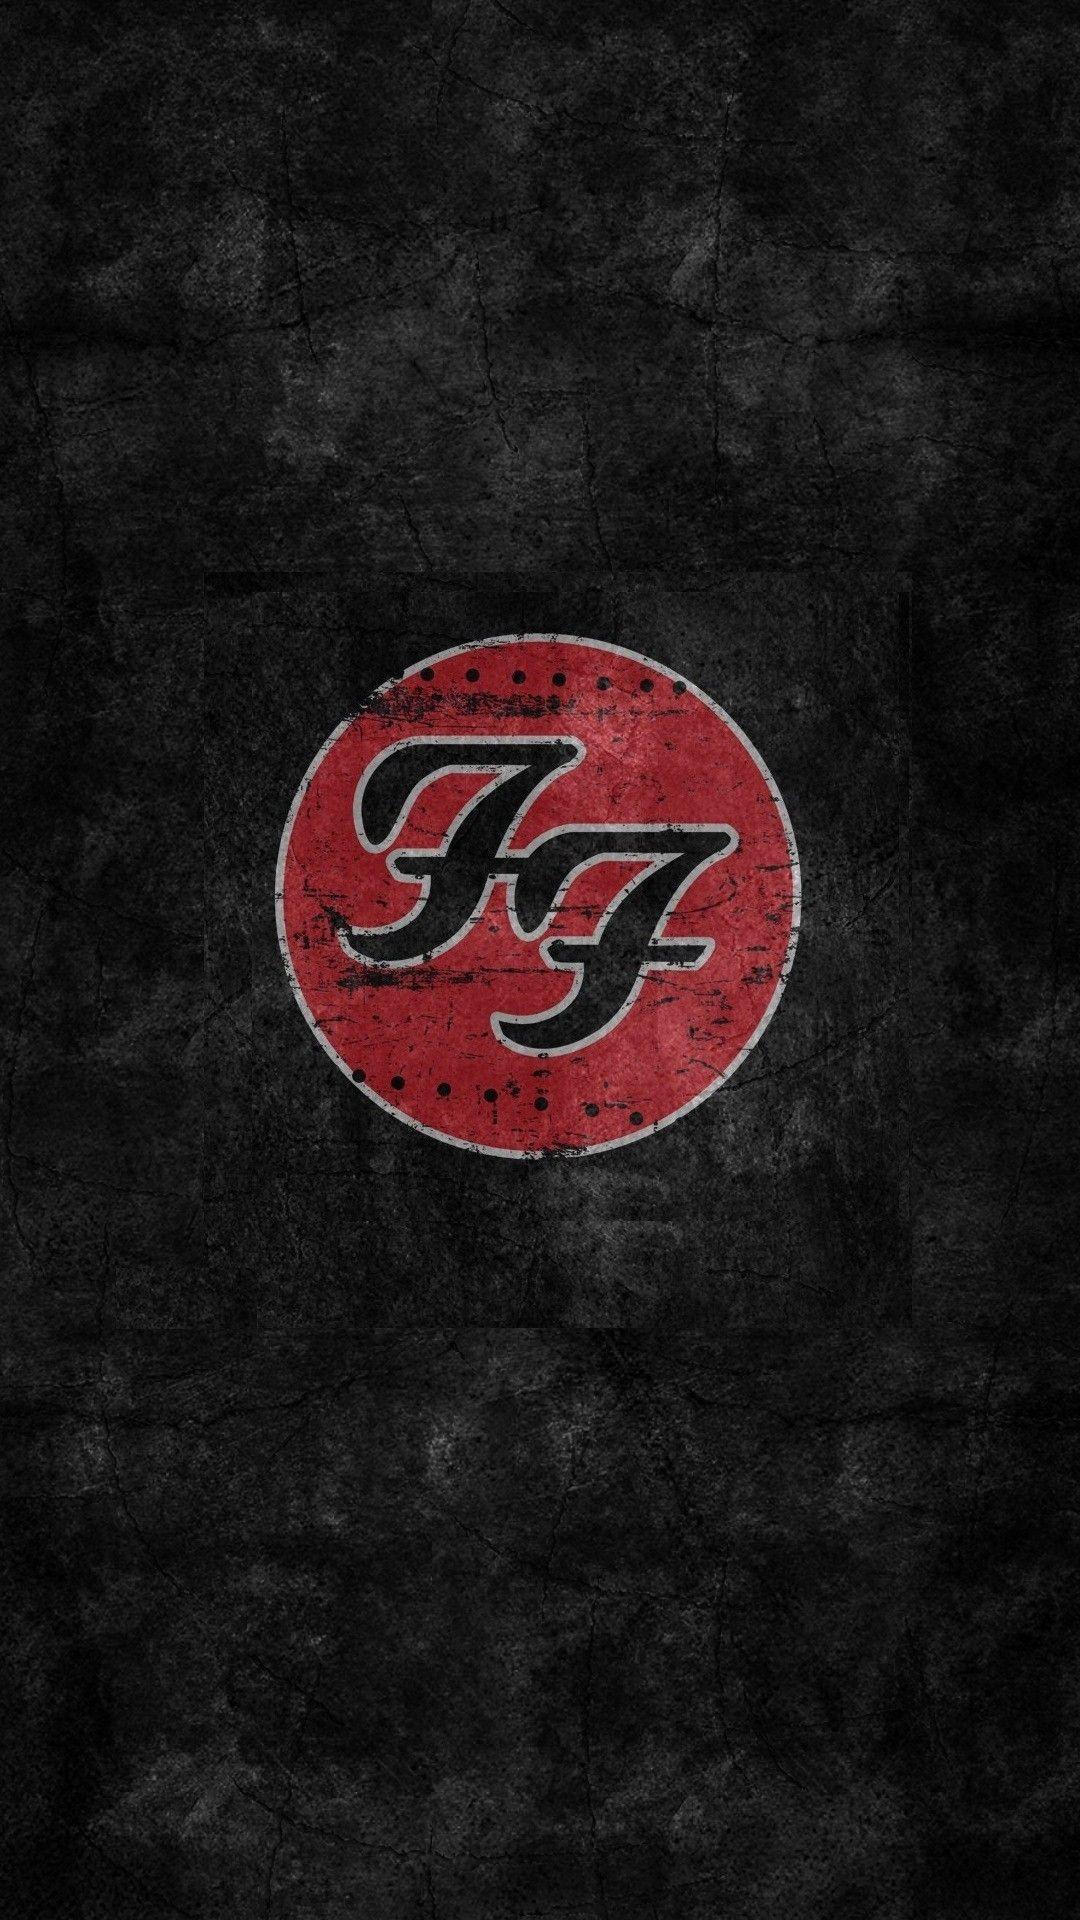 Simple Recognizable Repeatable Foo Fighters Logo Design